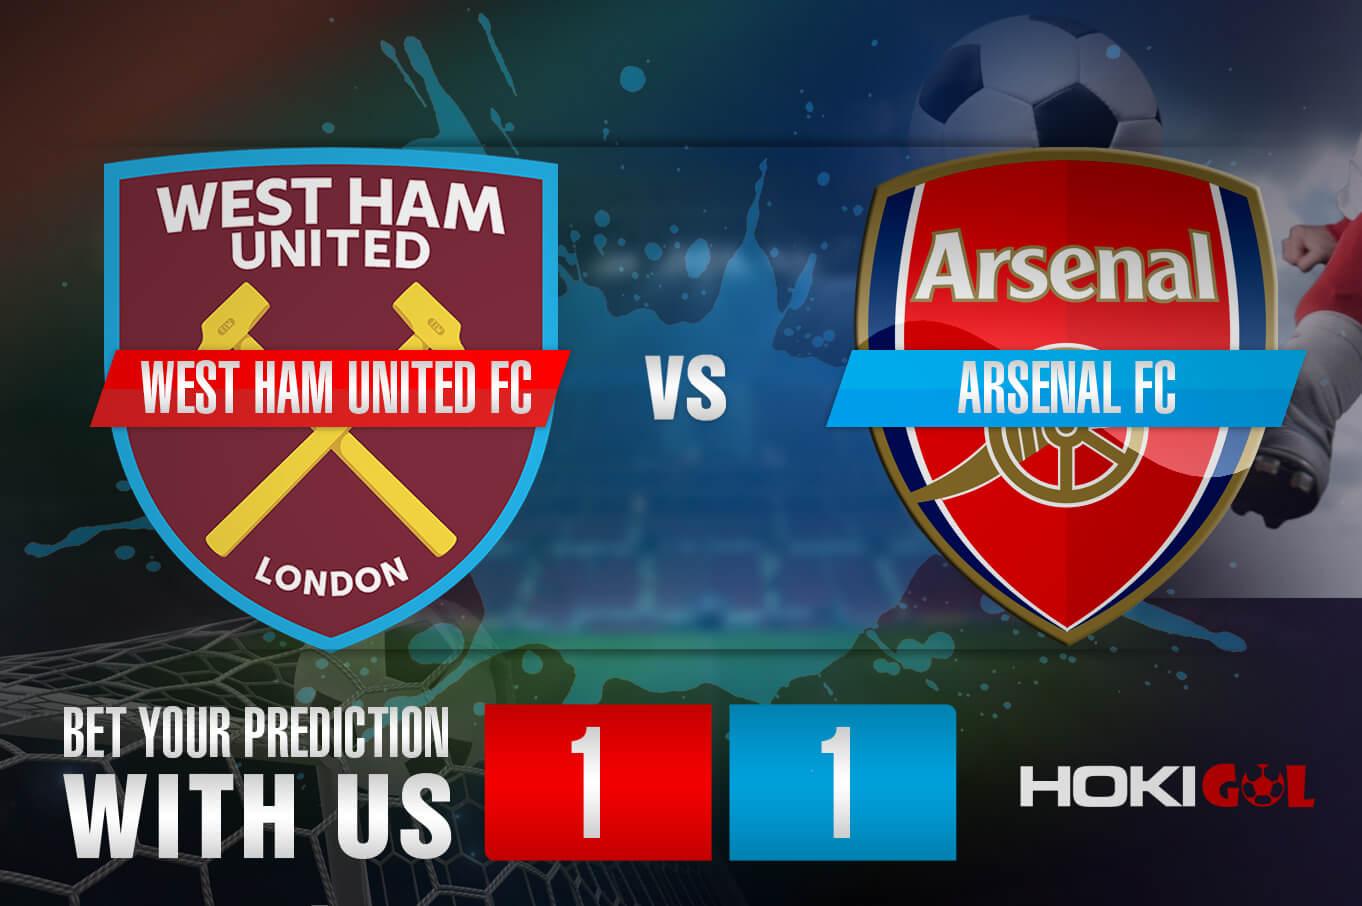 Prediksi Bola West Ham United FC Vs Arsenal FC 21 Maret 2021